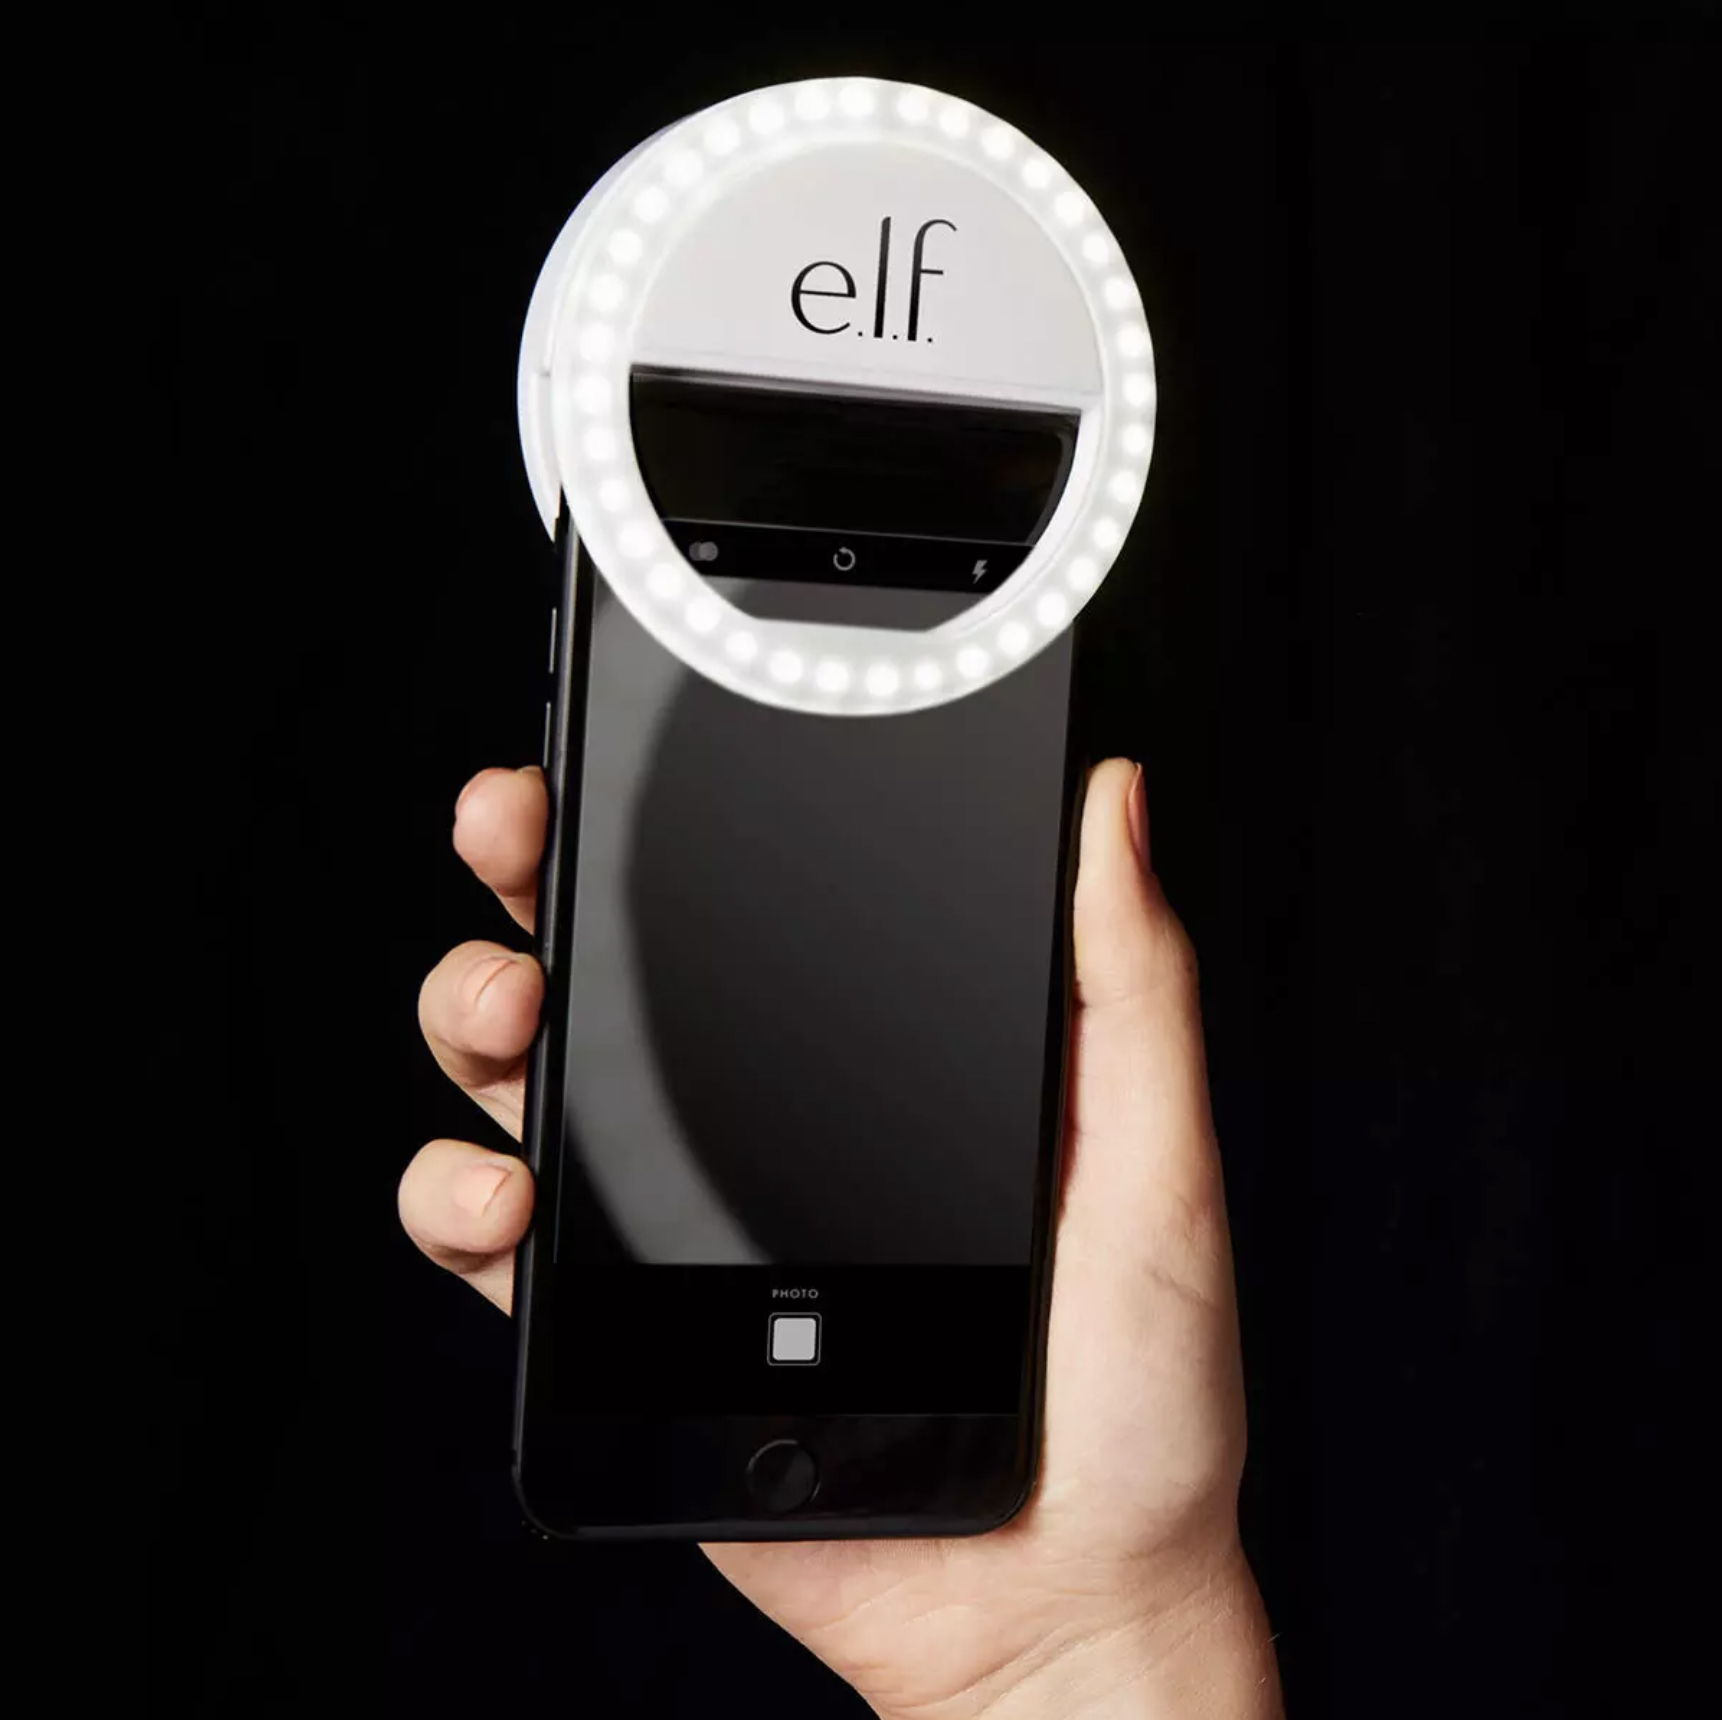 e.l.f. Cosmetics Glow on the Go Selfie Light